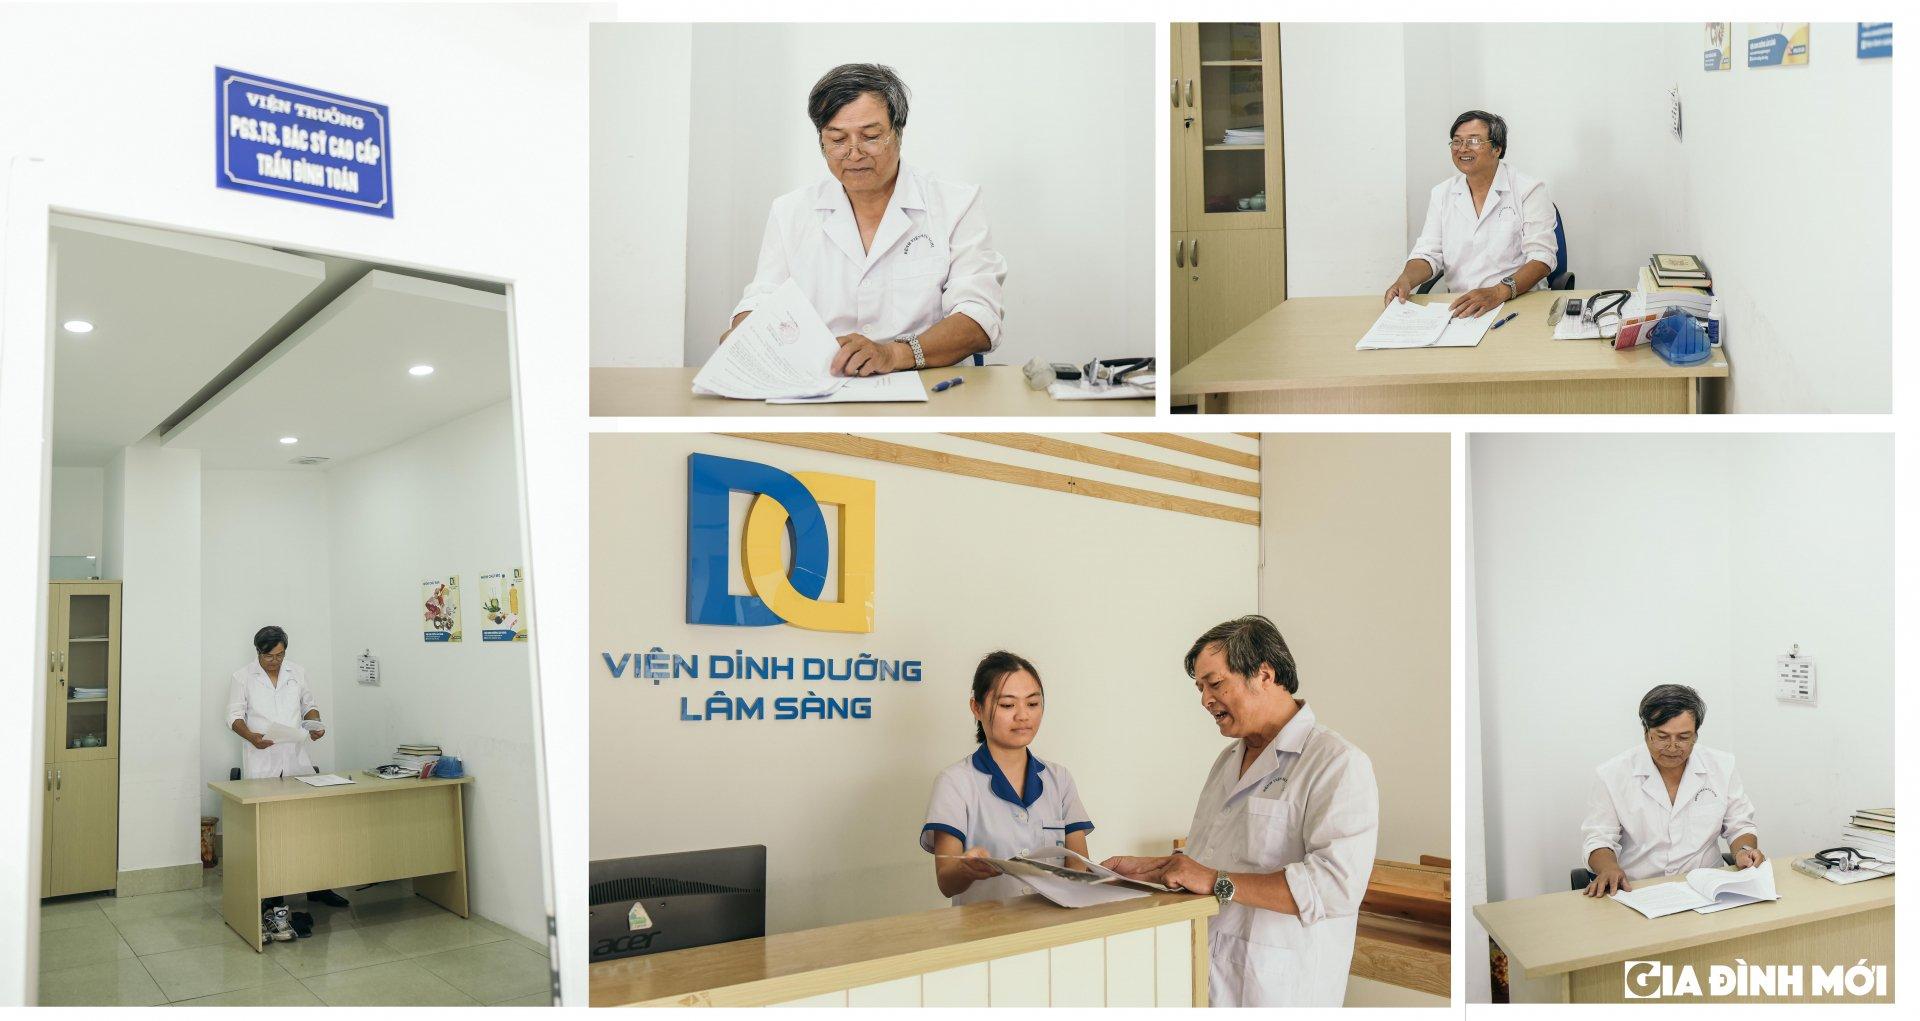 Nguyen Truong khoa Dinh duong benh vien Huu Nghi: 'Toi thich di cho va say sua voi cong viec do' hinh anh 7